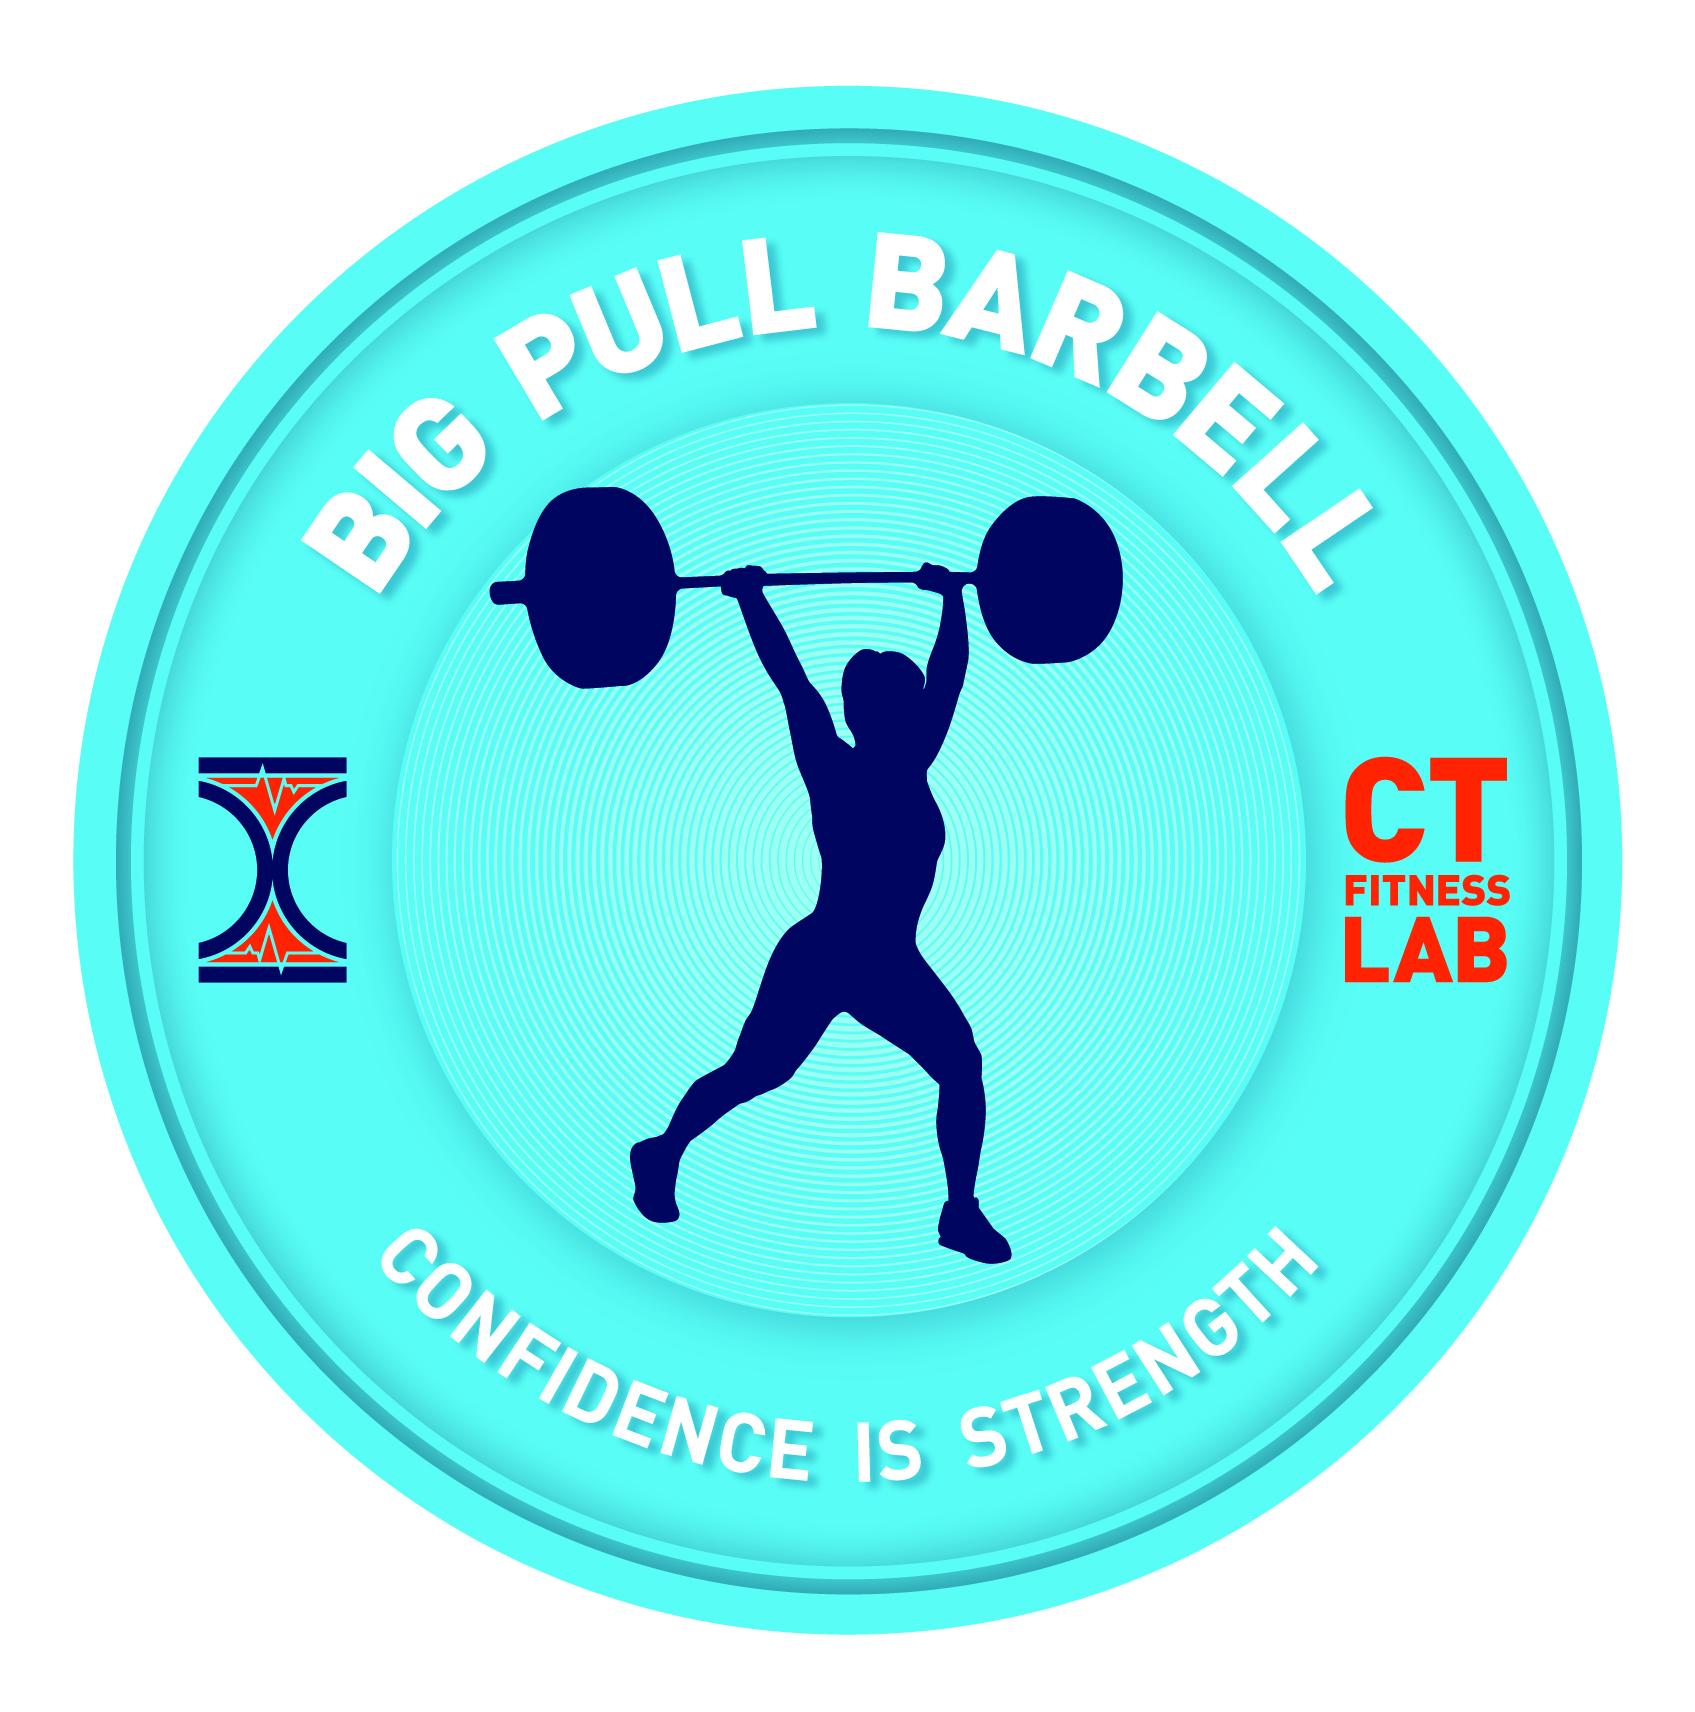 BigPullBarbell_Womens-02